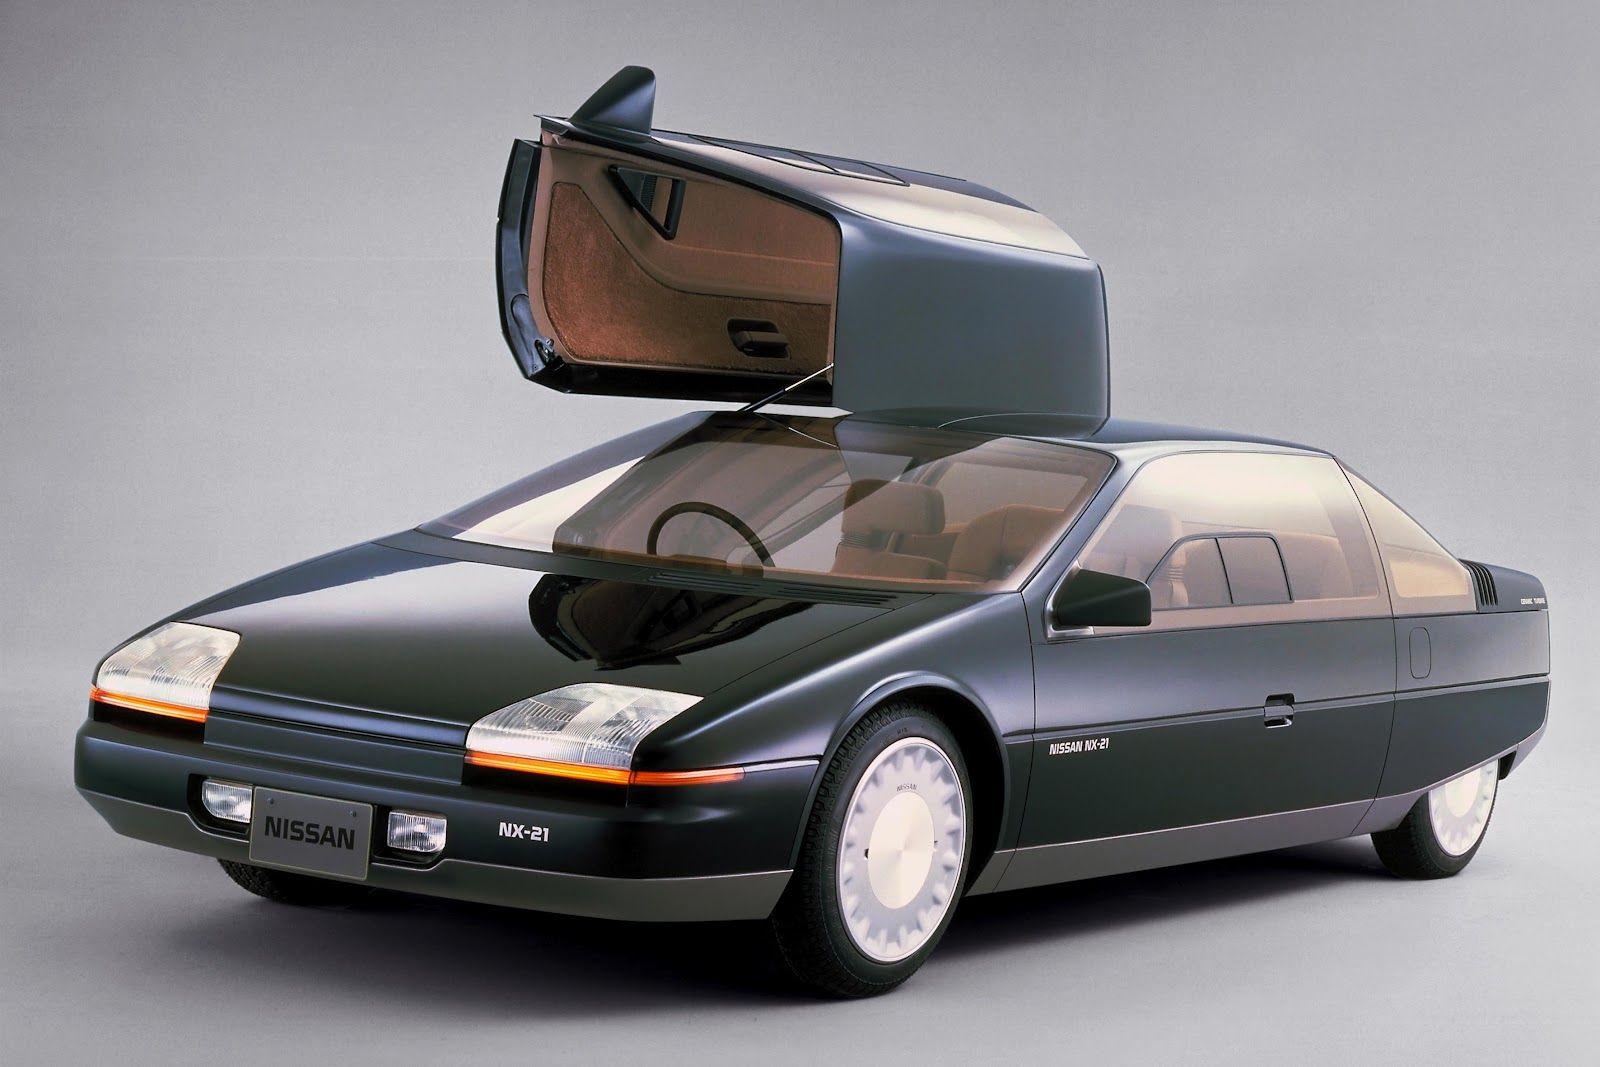 83 Nissan NX-21 Concept | CONCEPT CARS - FOREIGN | Pinterest ...